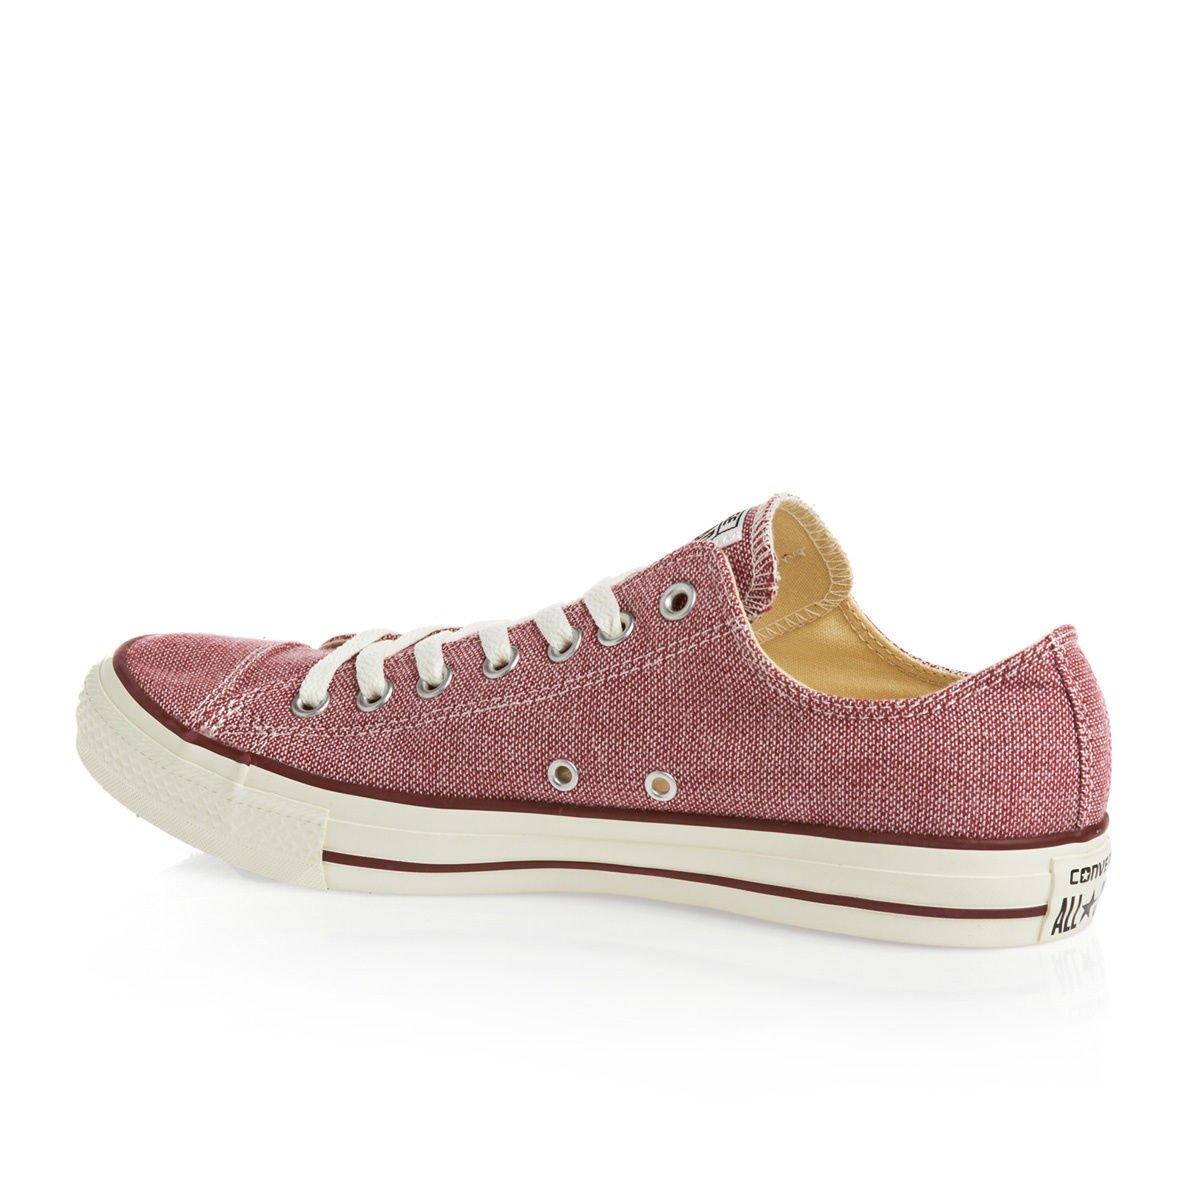 e3558b5e9b52 Converse CT Ox Shoe - Gooseberry Egret 142342F  Amazon.co.uk  Shoes   Bags